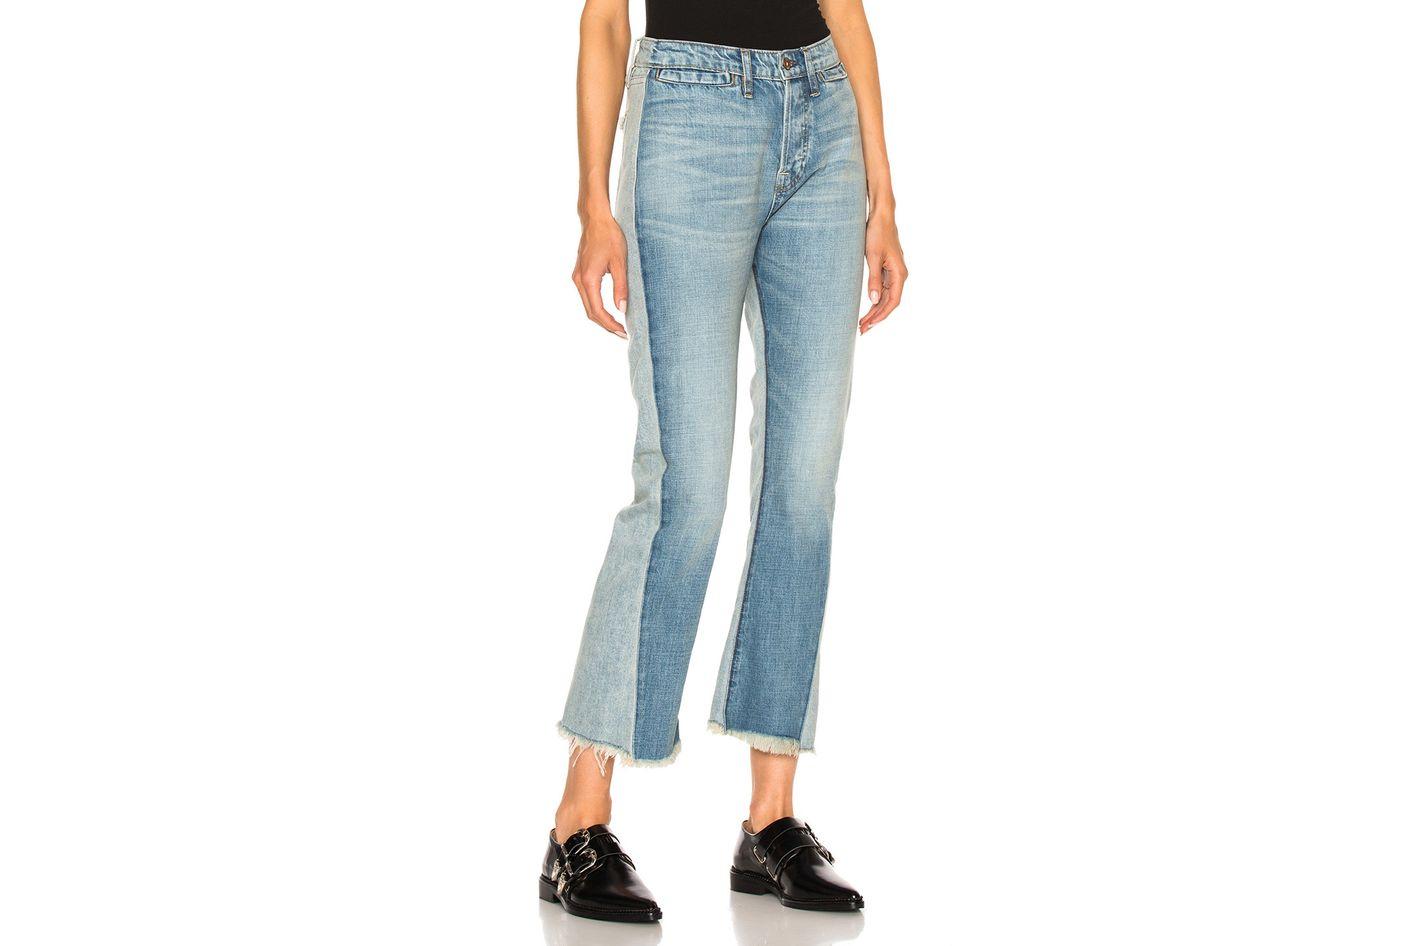 NSF Aero Straight Jeans